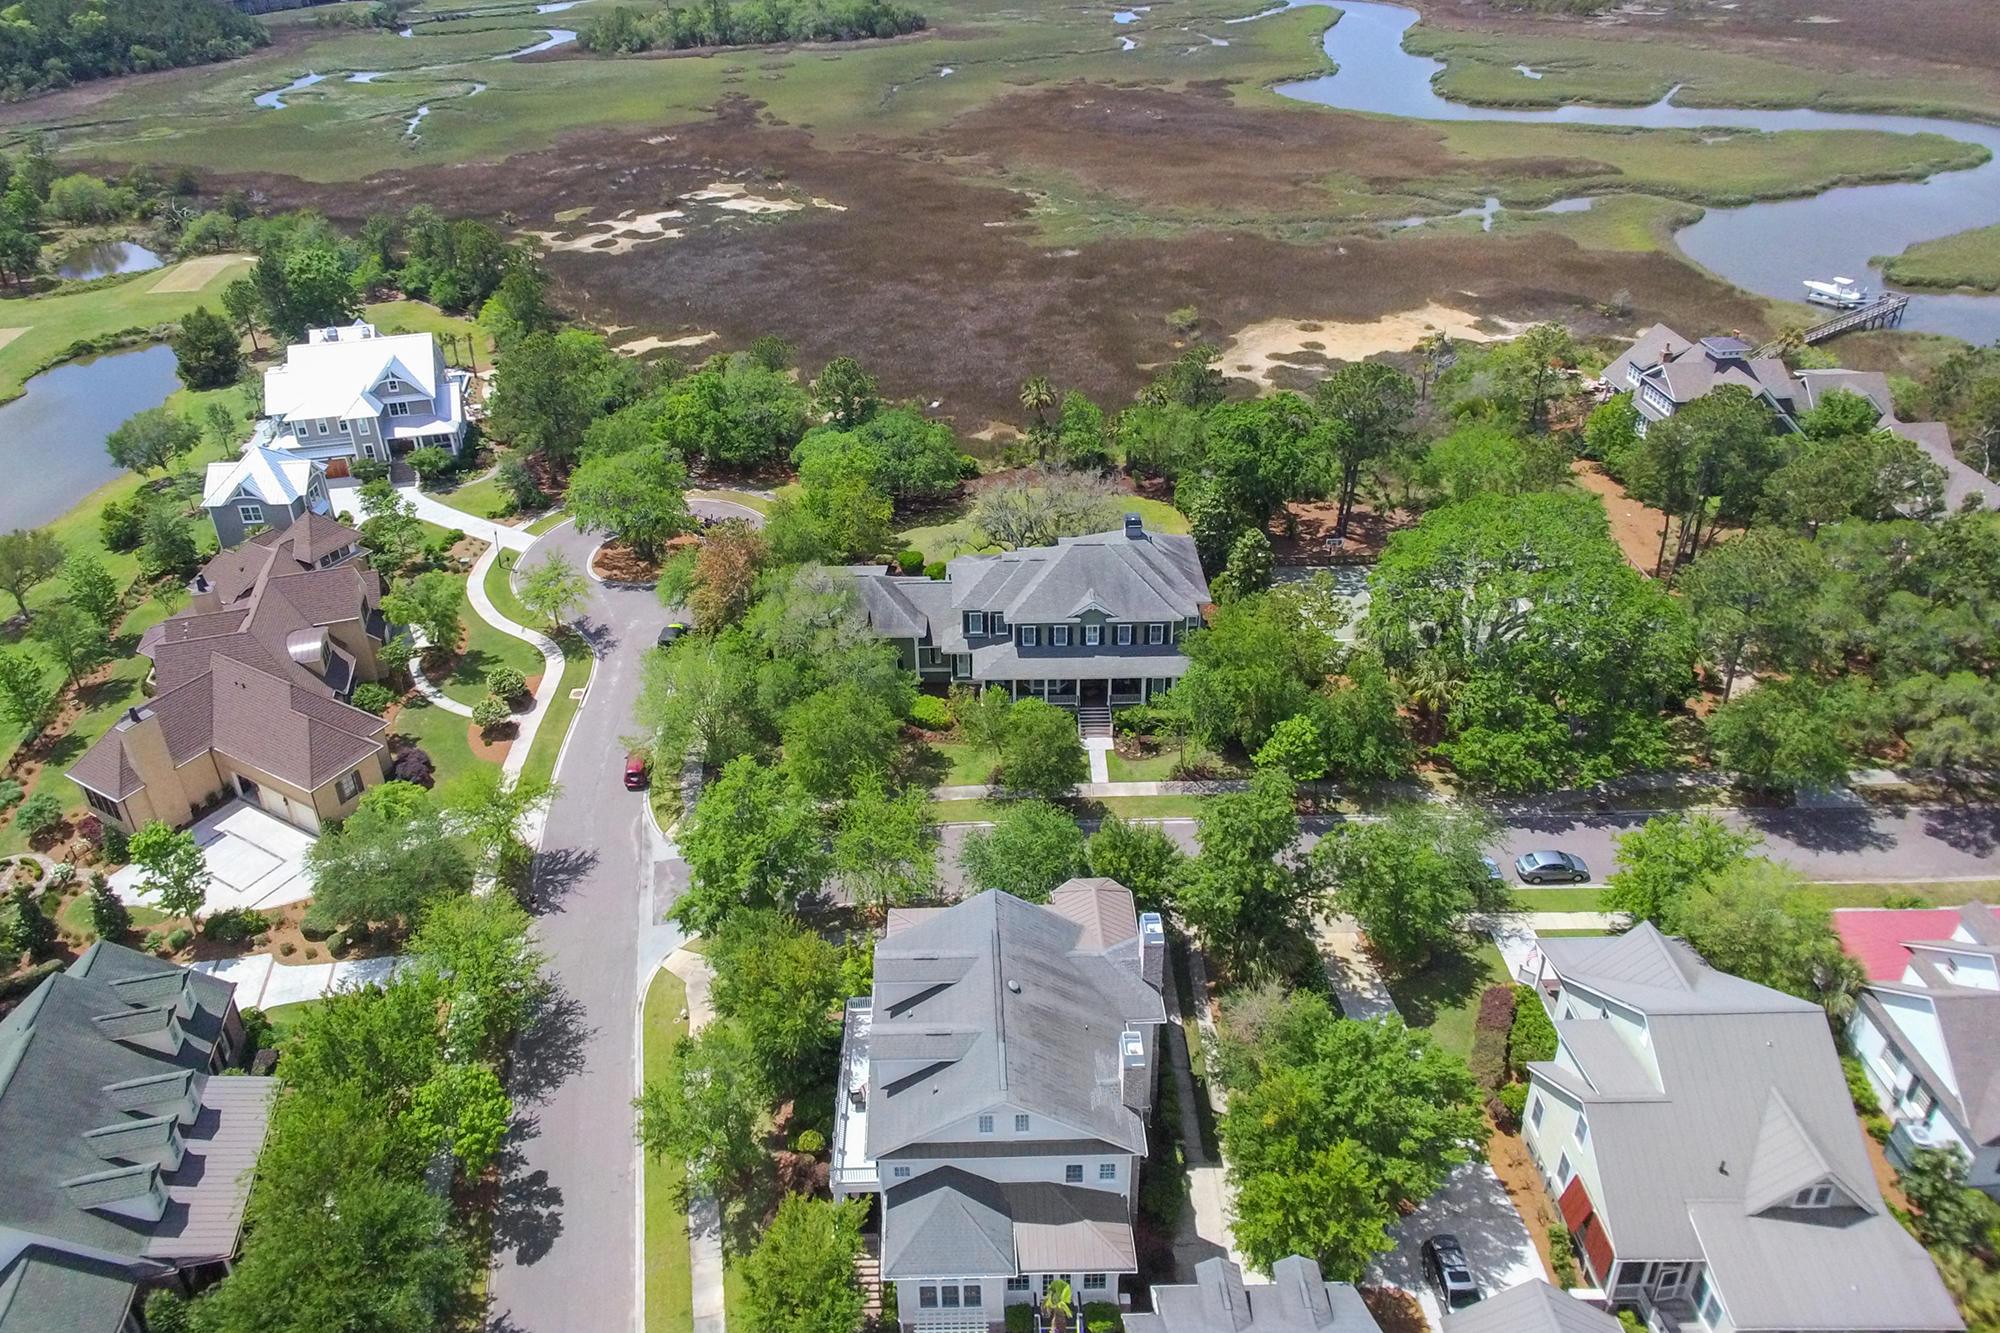 Daniel Island Park Homes For Sale - 1 Lafar, Daniel Island, SC - 5